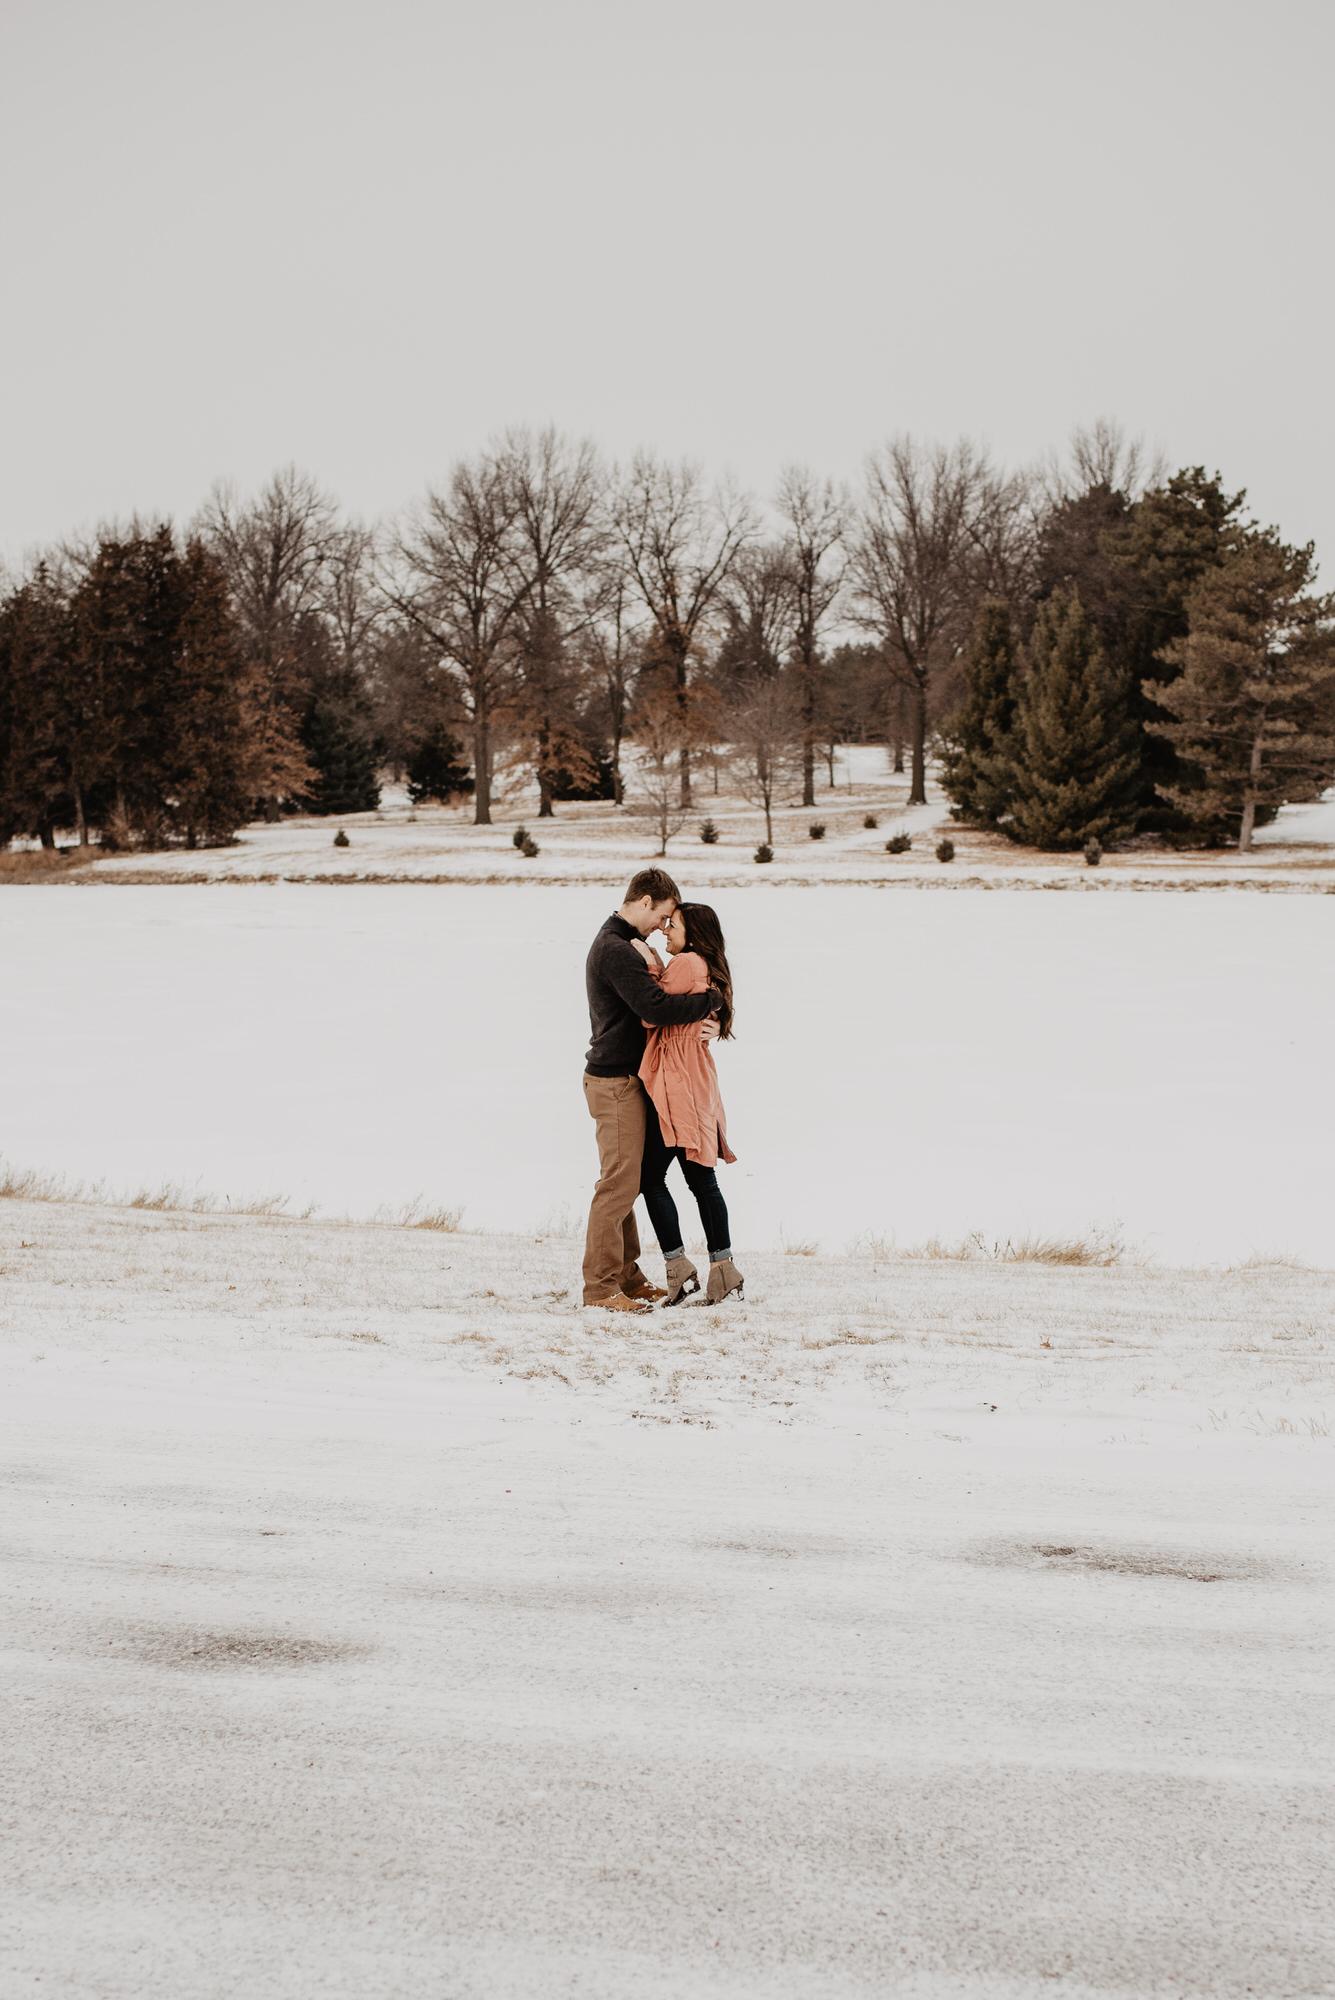 Lincoln-Columbus-Nebraska-Winter-Engagement-Kaylie-Sirek-Photography-11.jpg